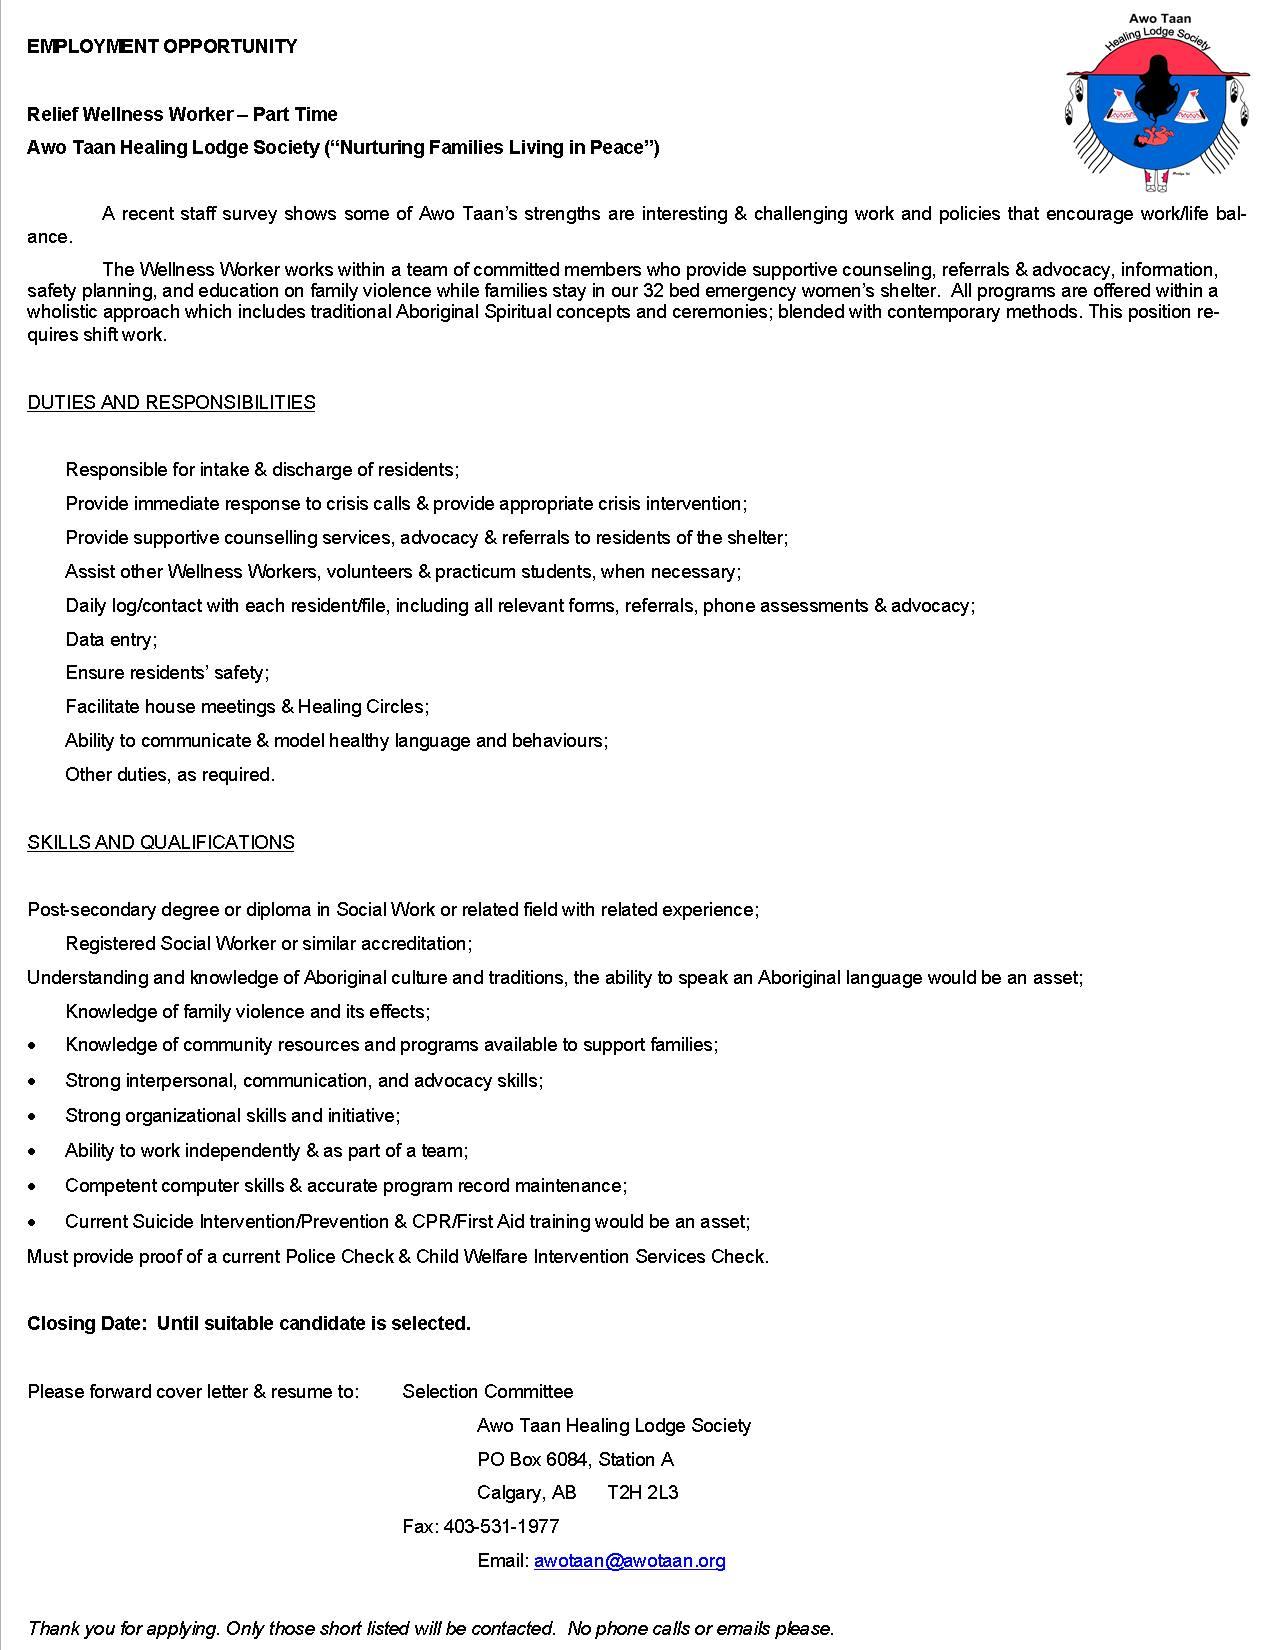 Awo Tann hiring